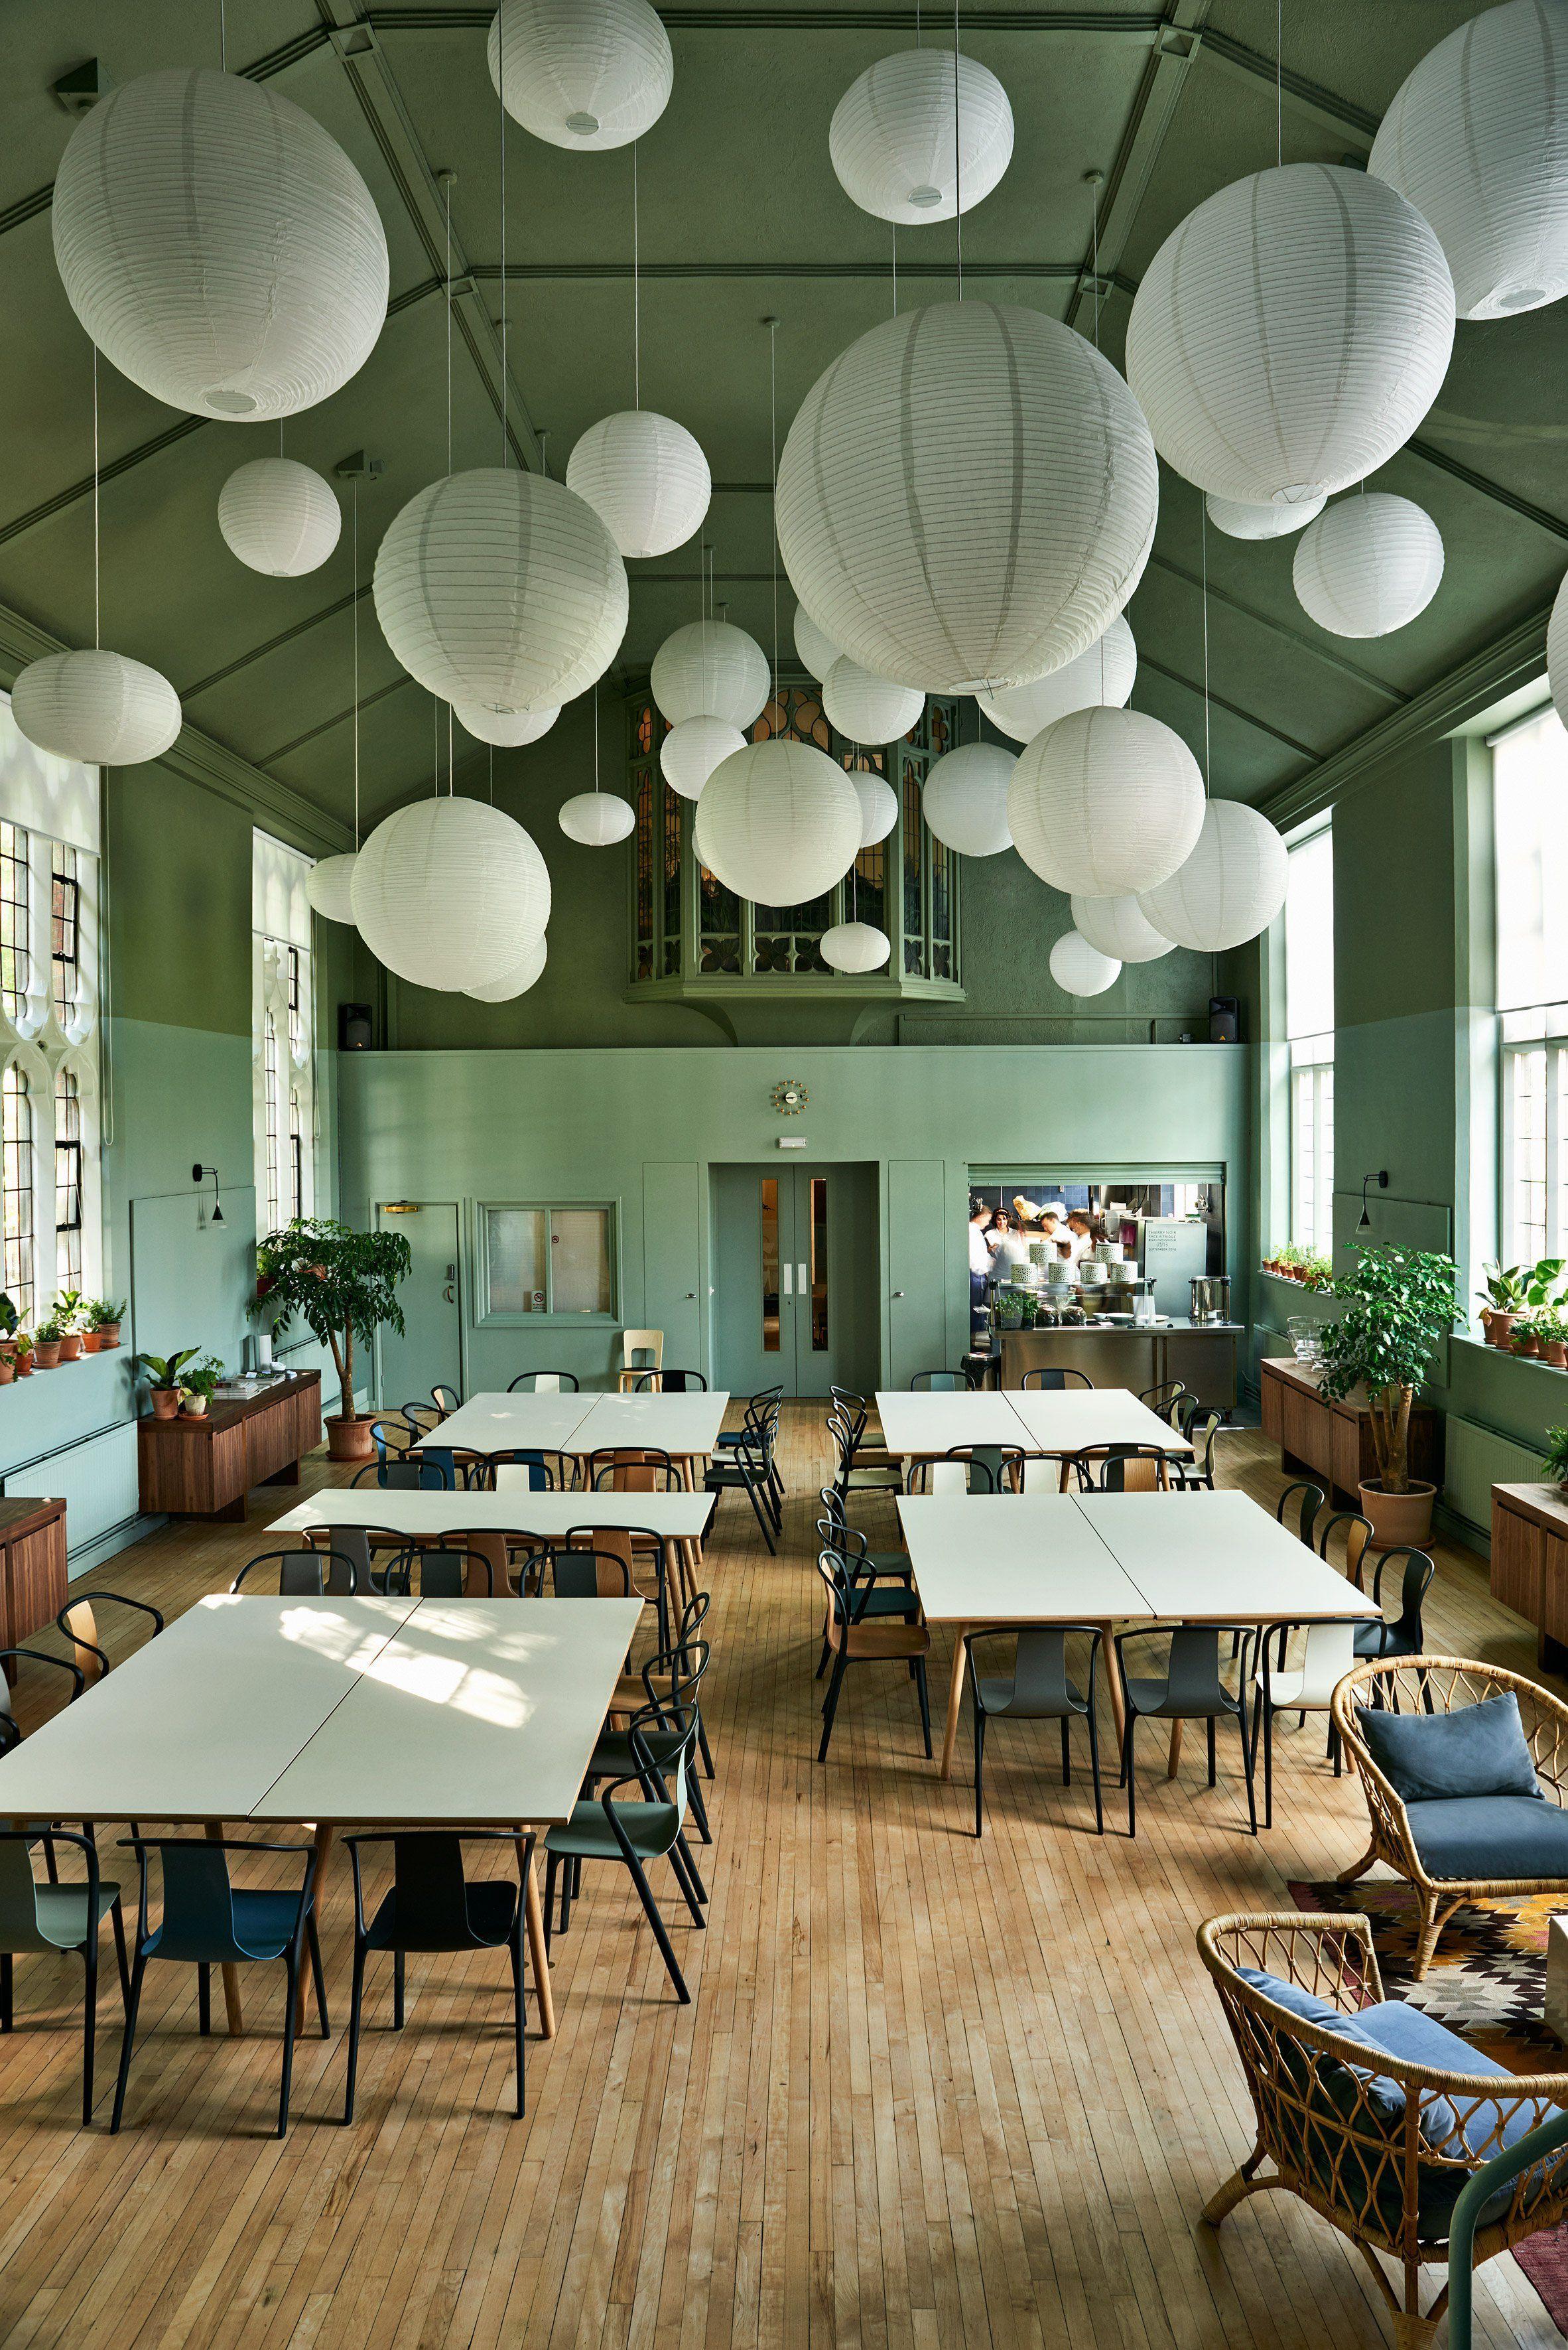 Feel amazed by discovering the best uk interior designers here delightfull also meet in rh pinterest